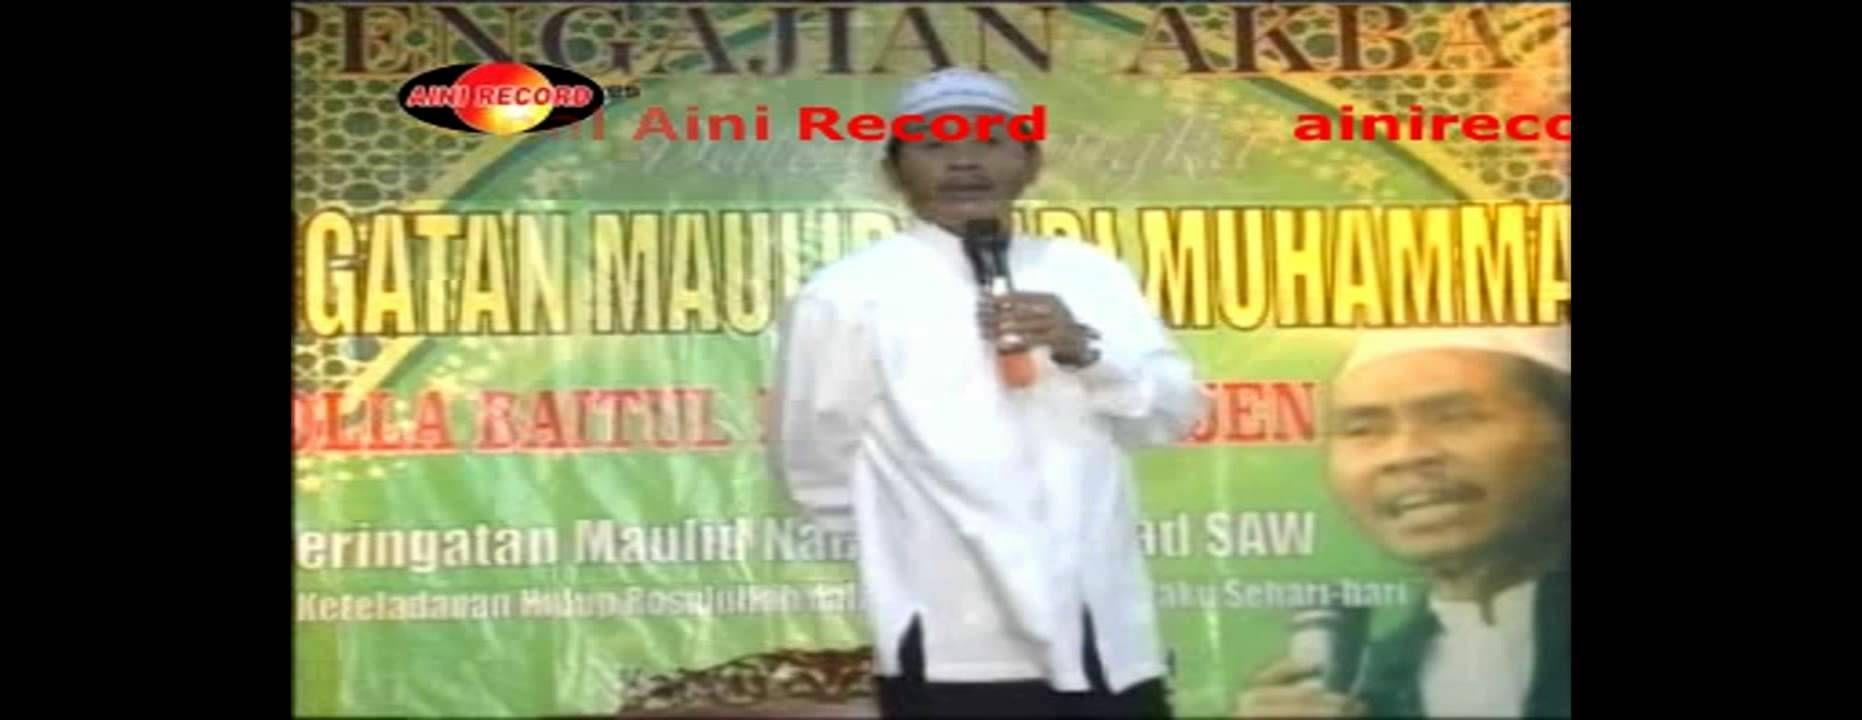 Pengajian Lucu 2015 KH Anwar Zahid Terbaru Maulid Nabi Muhammad